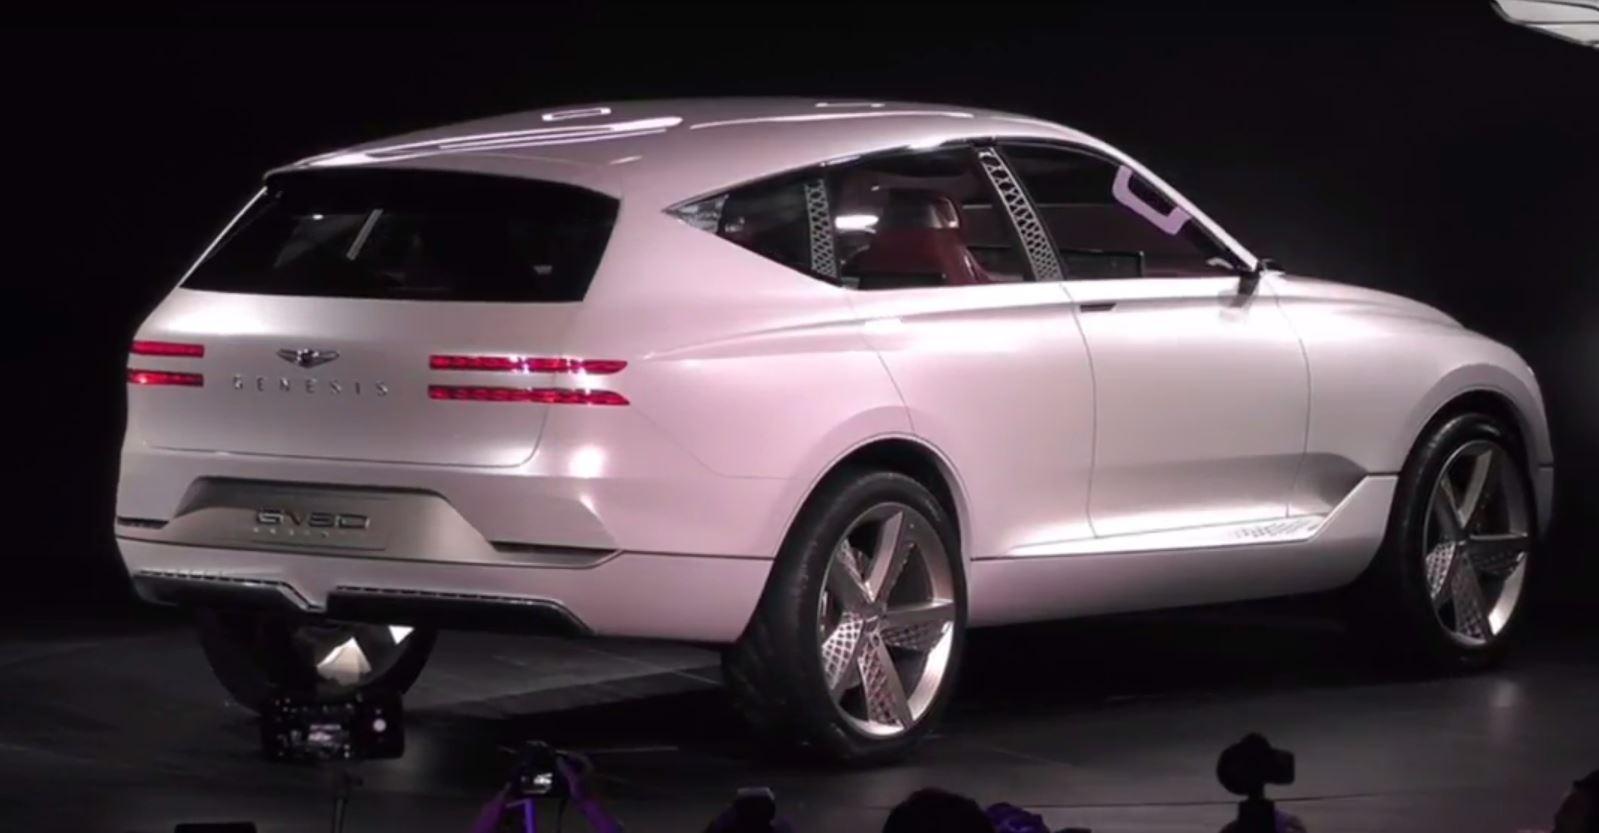 Leaked Photos Show New Genesis Gv80 Luxury Suv The News Wheel